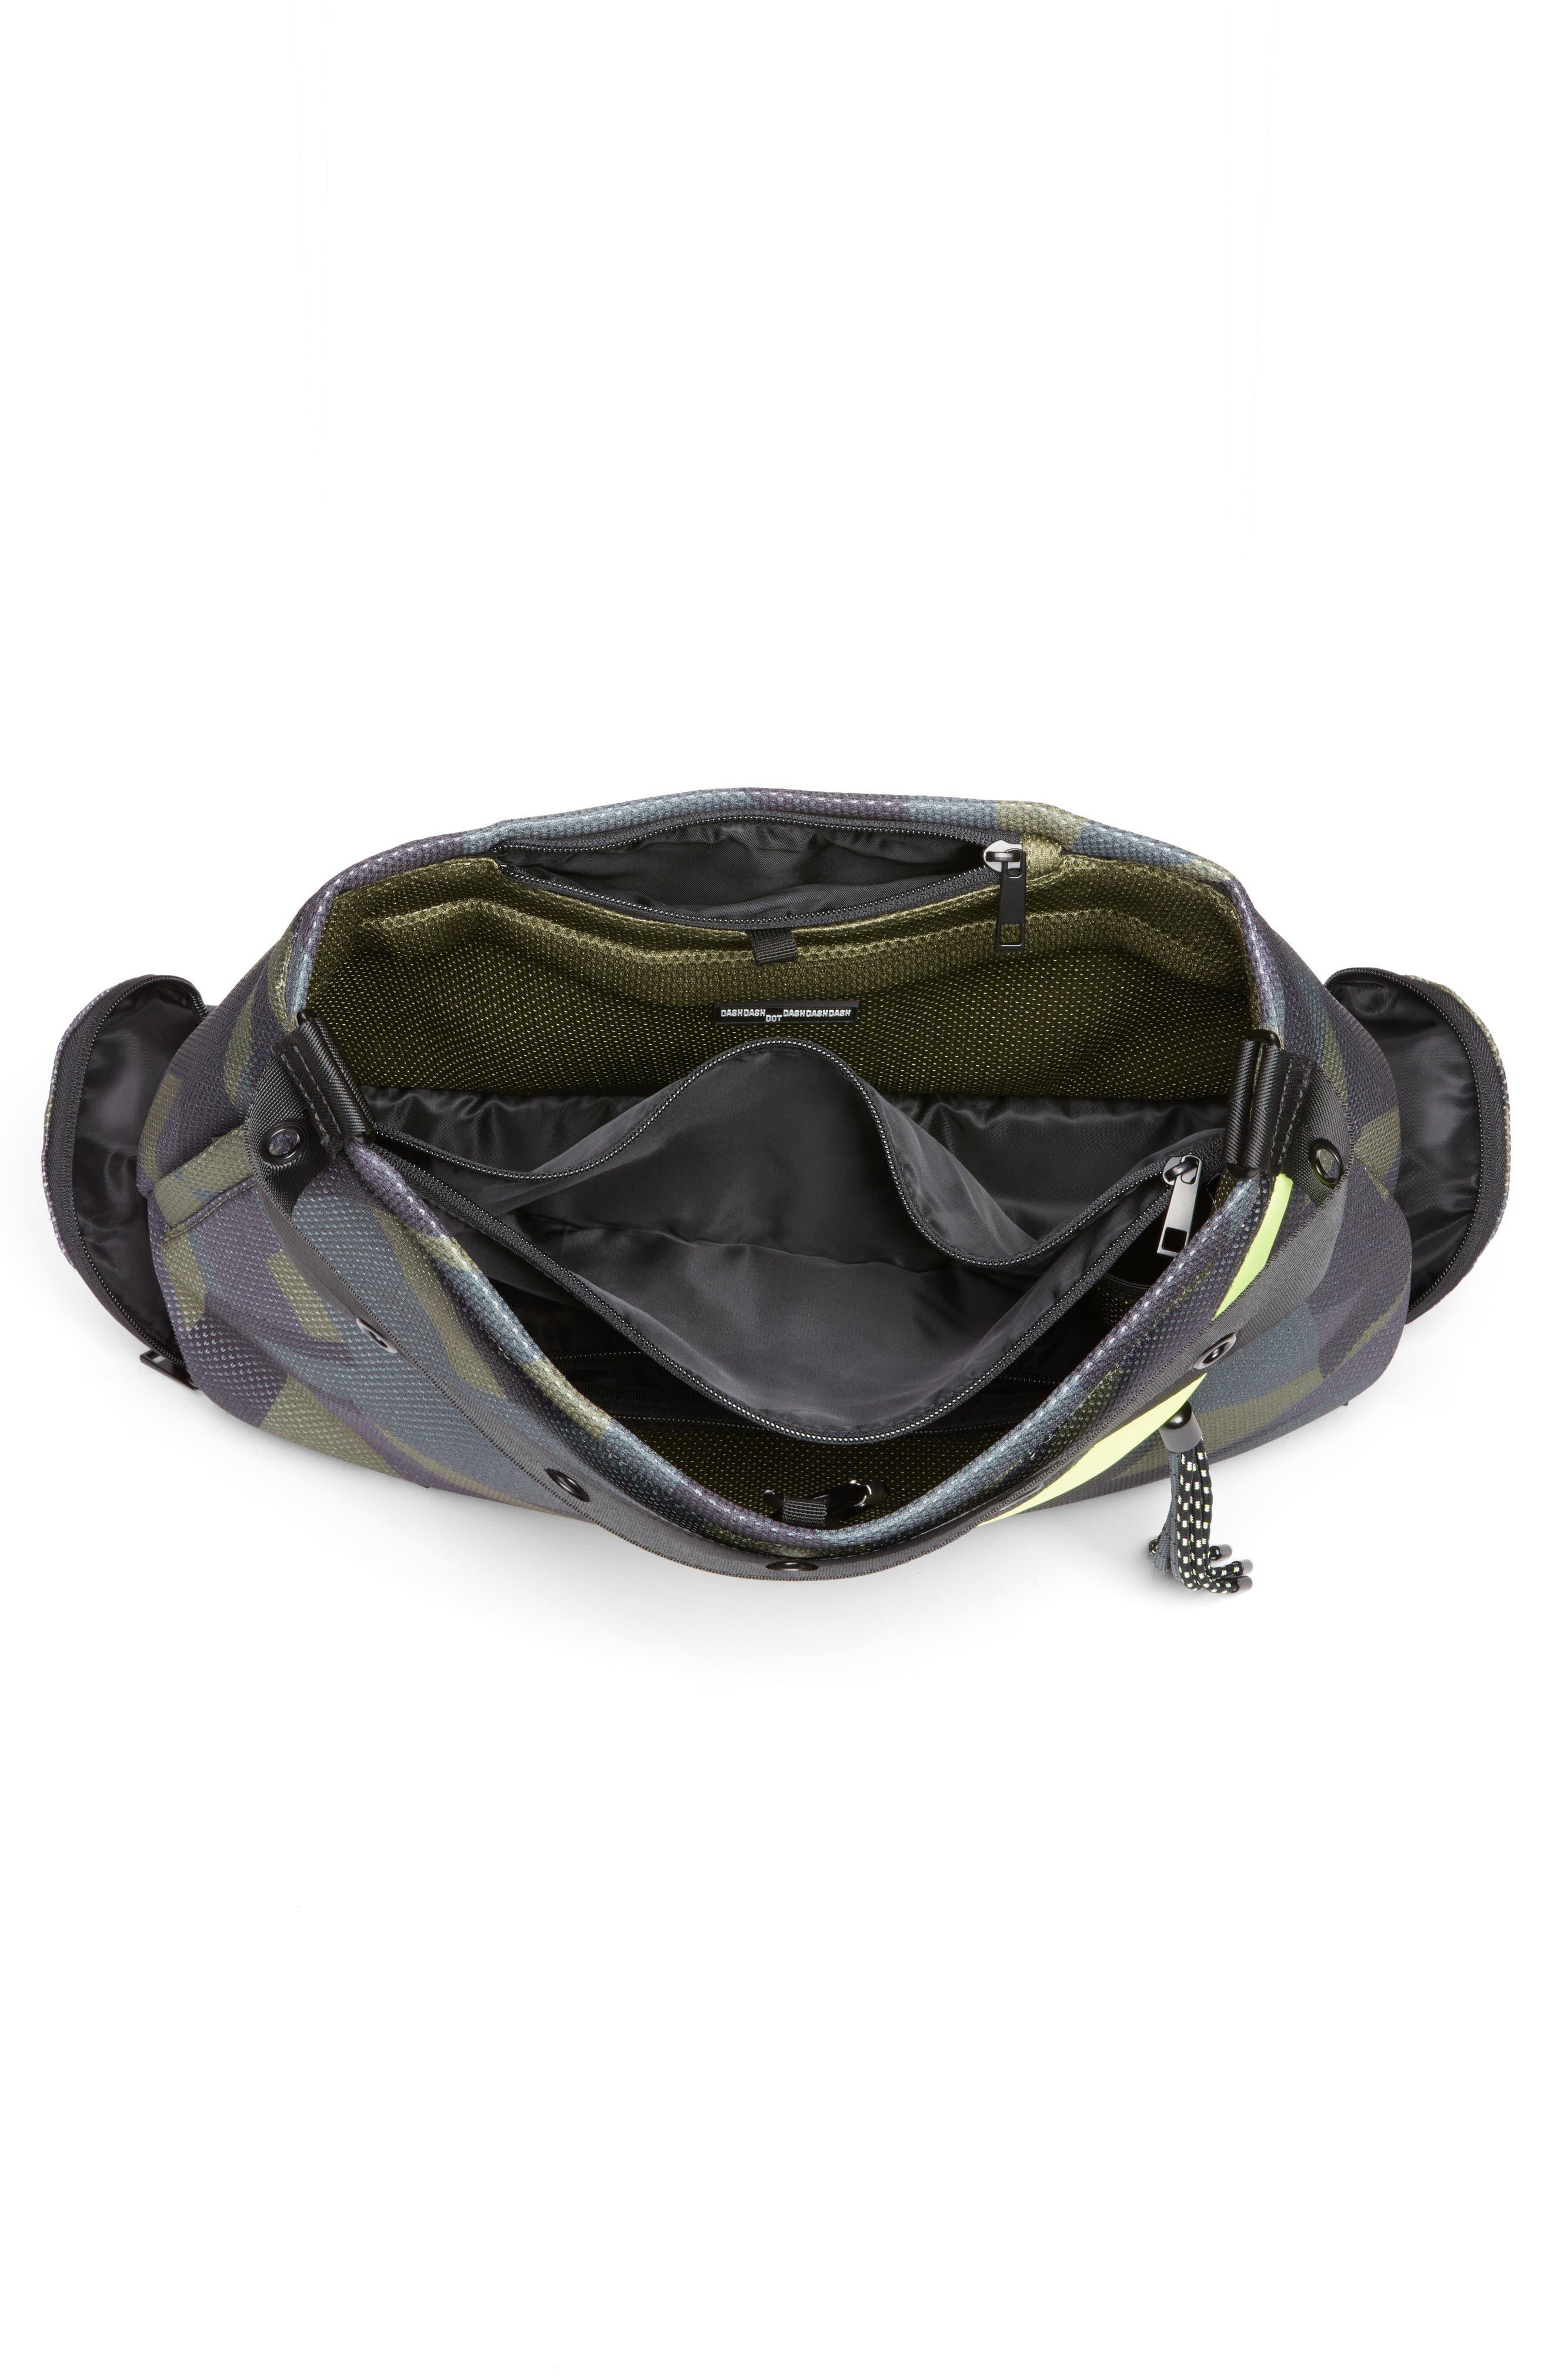 Infinity Water Resistant Bag,                             Alternate thumbnail 4, color,                             300